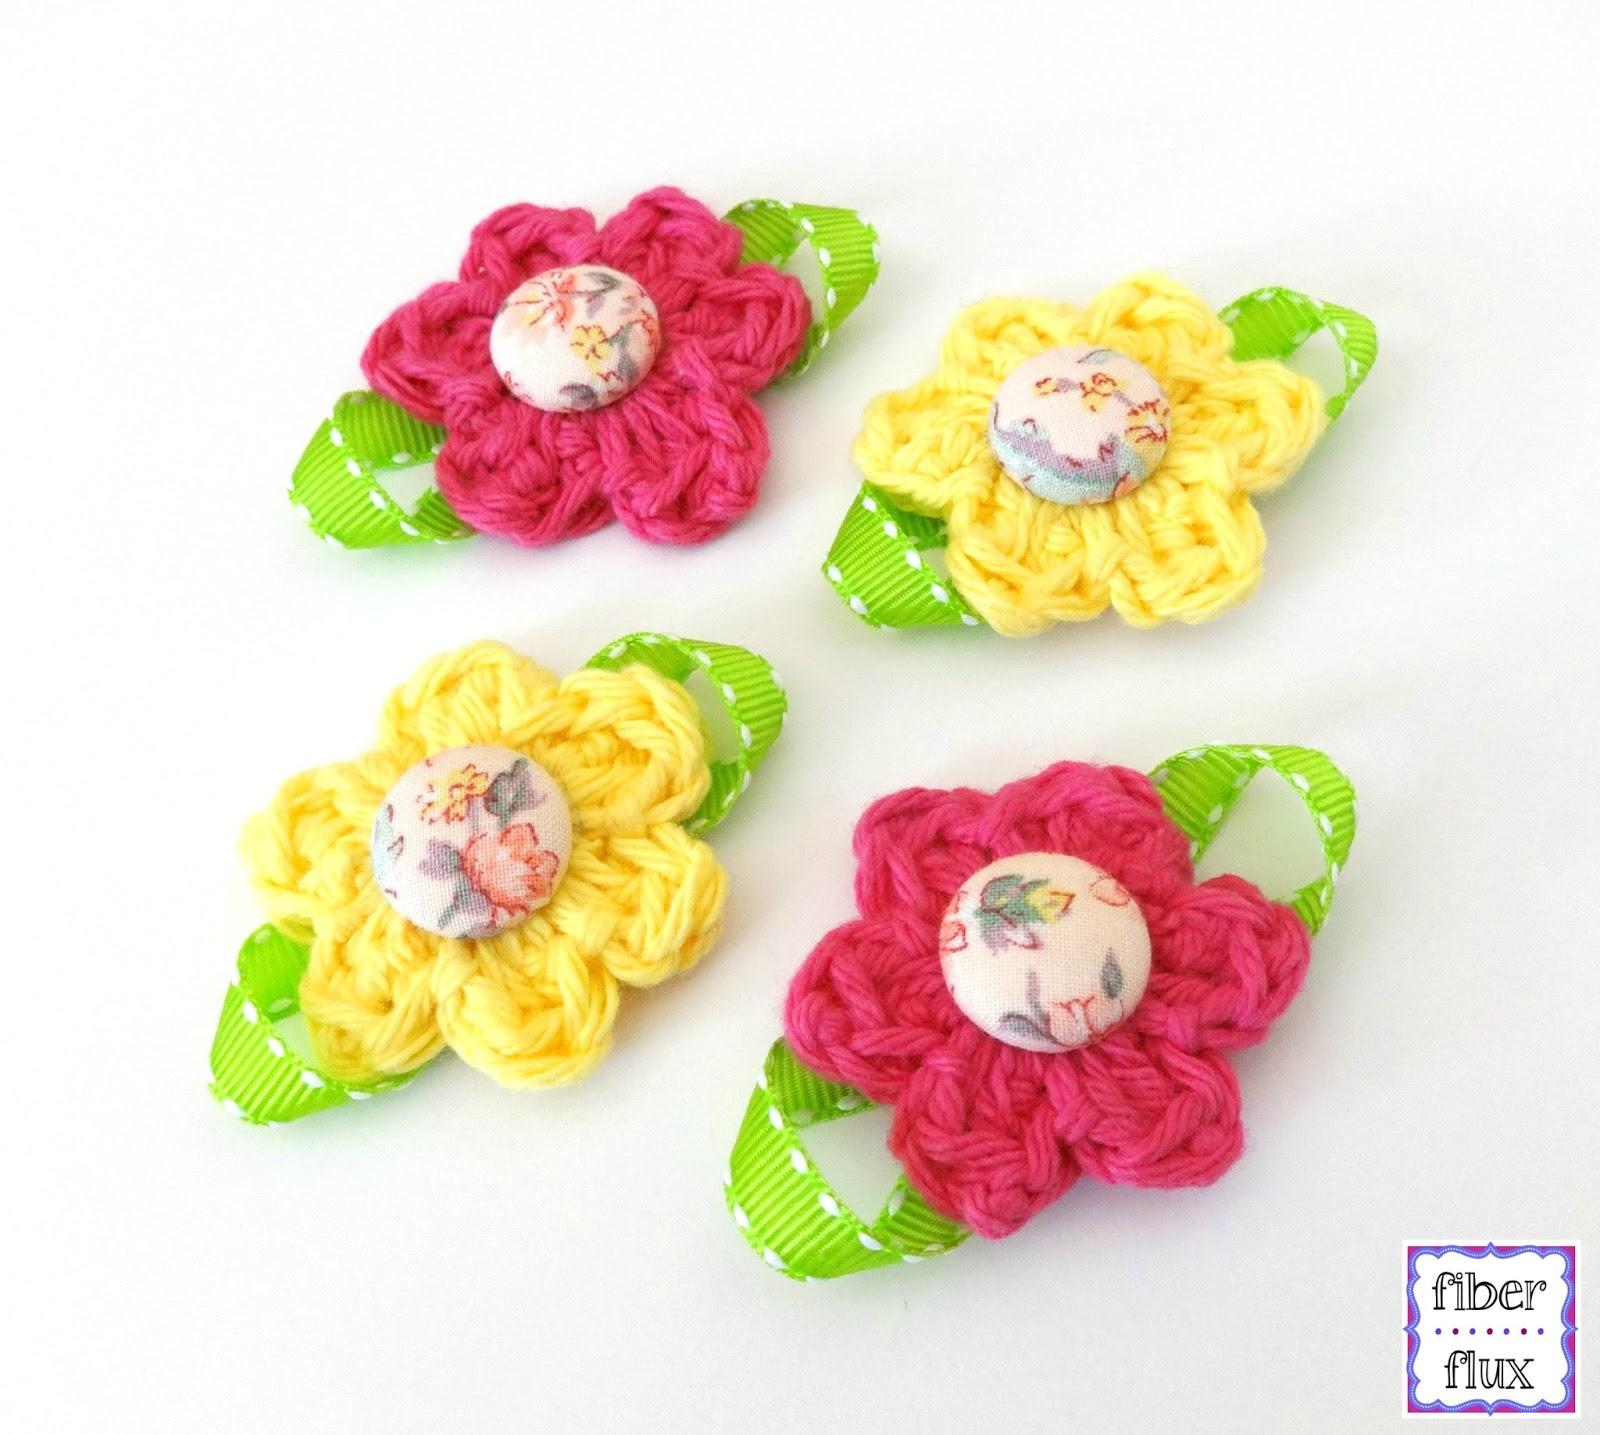 Fiber Flux Free Crochet Patternutique Daisy